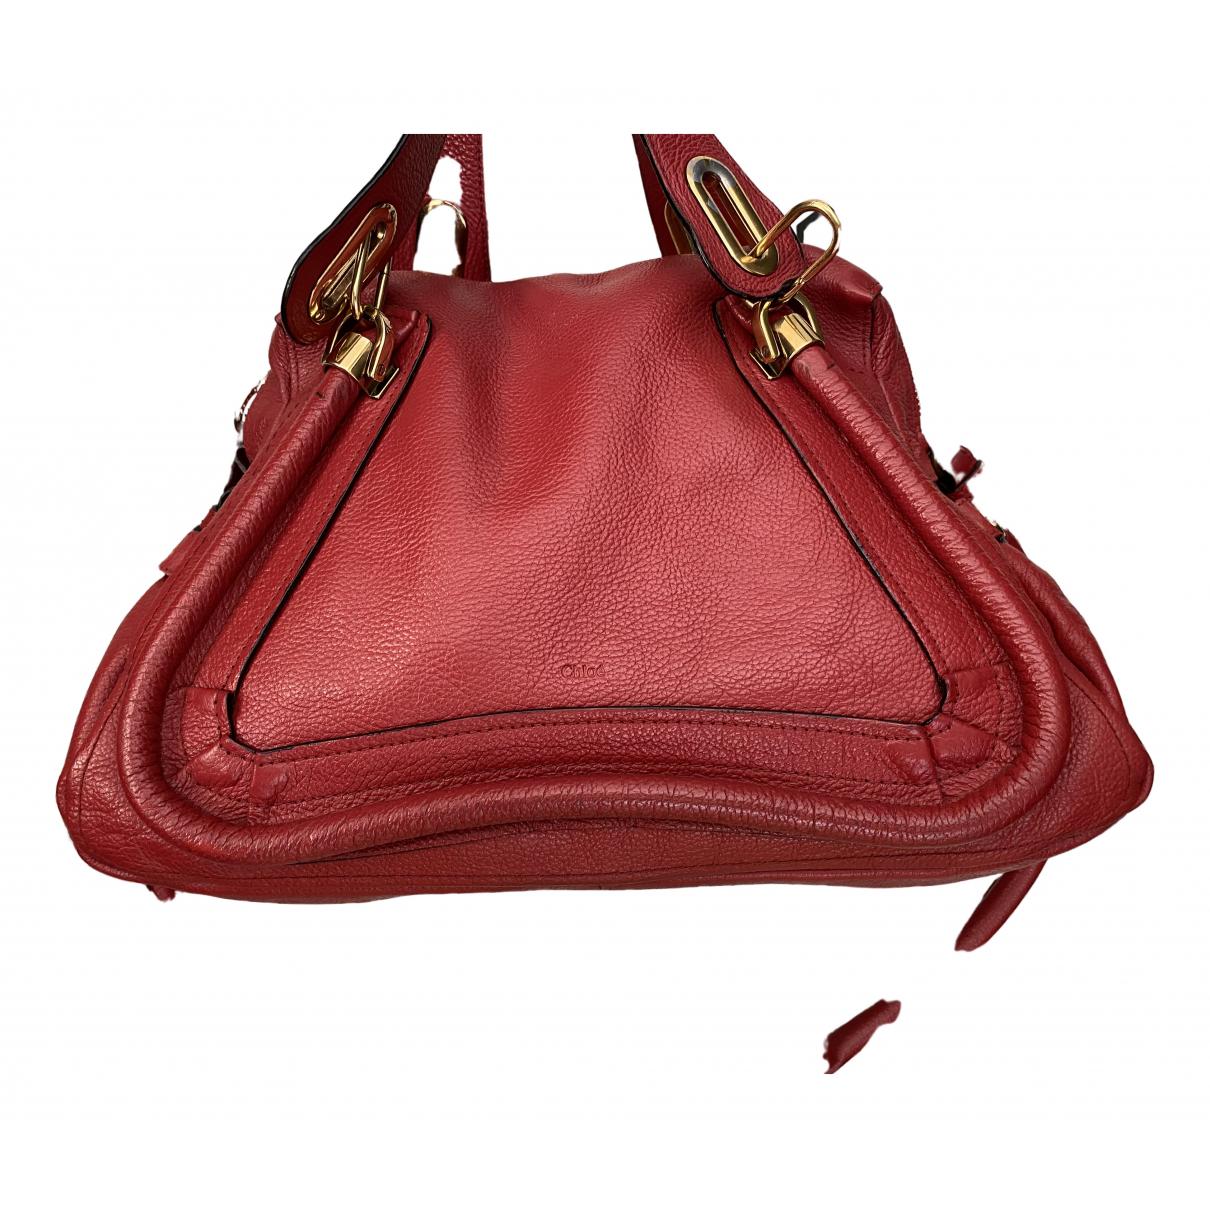 Chloé Paraty Red Leather handbag for Women N